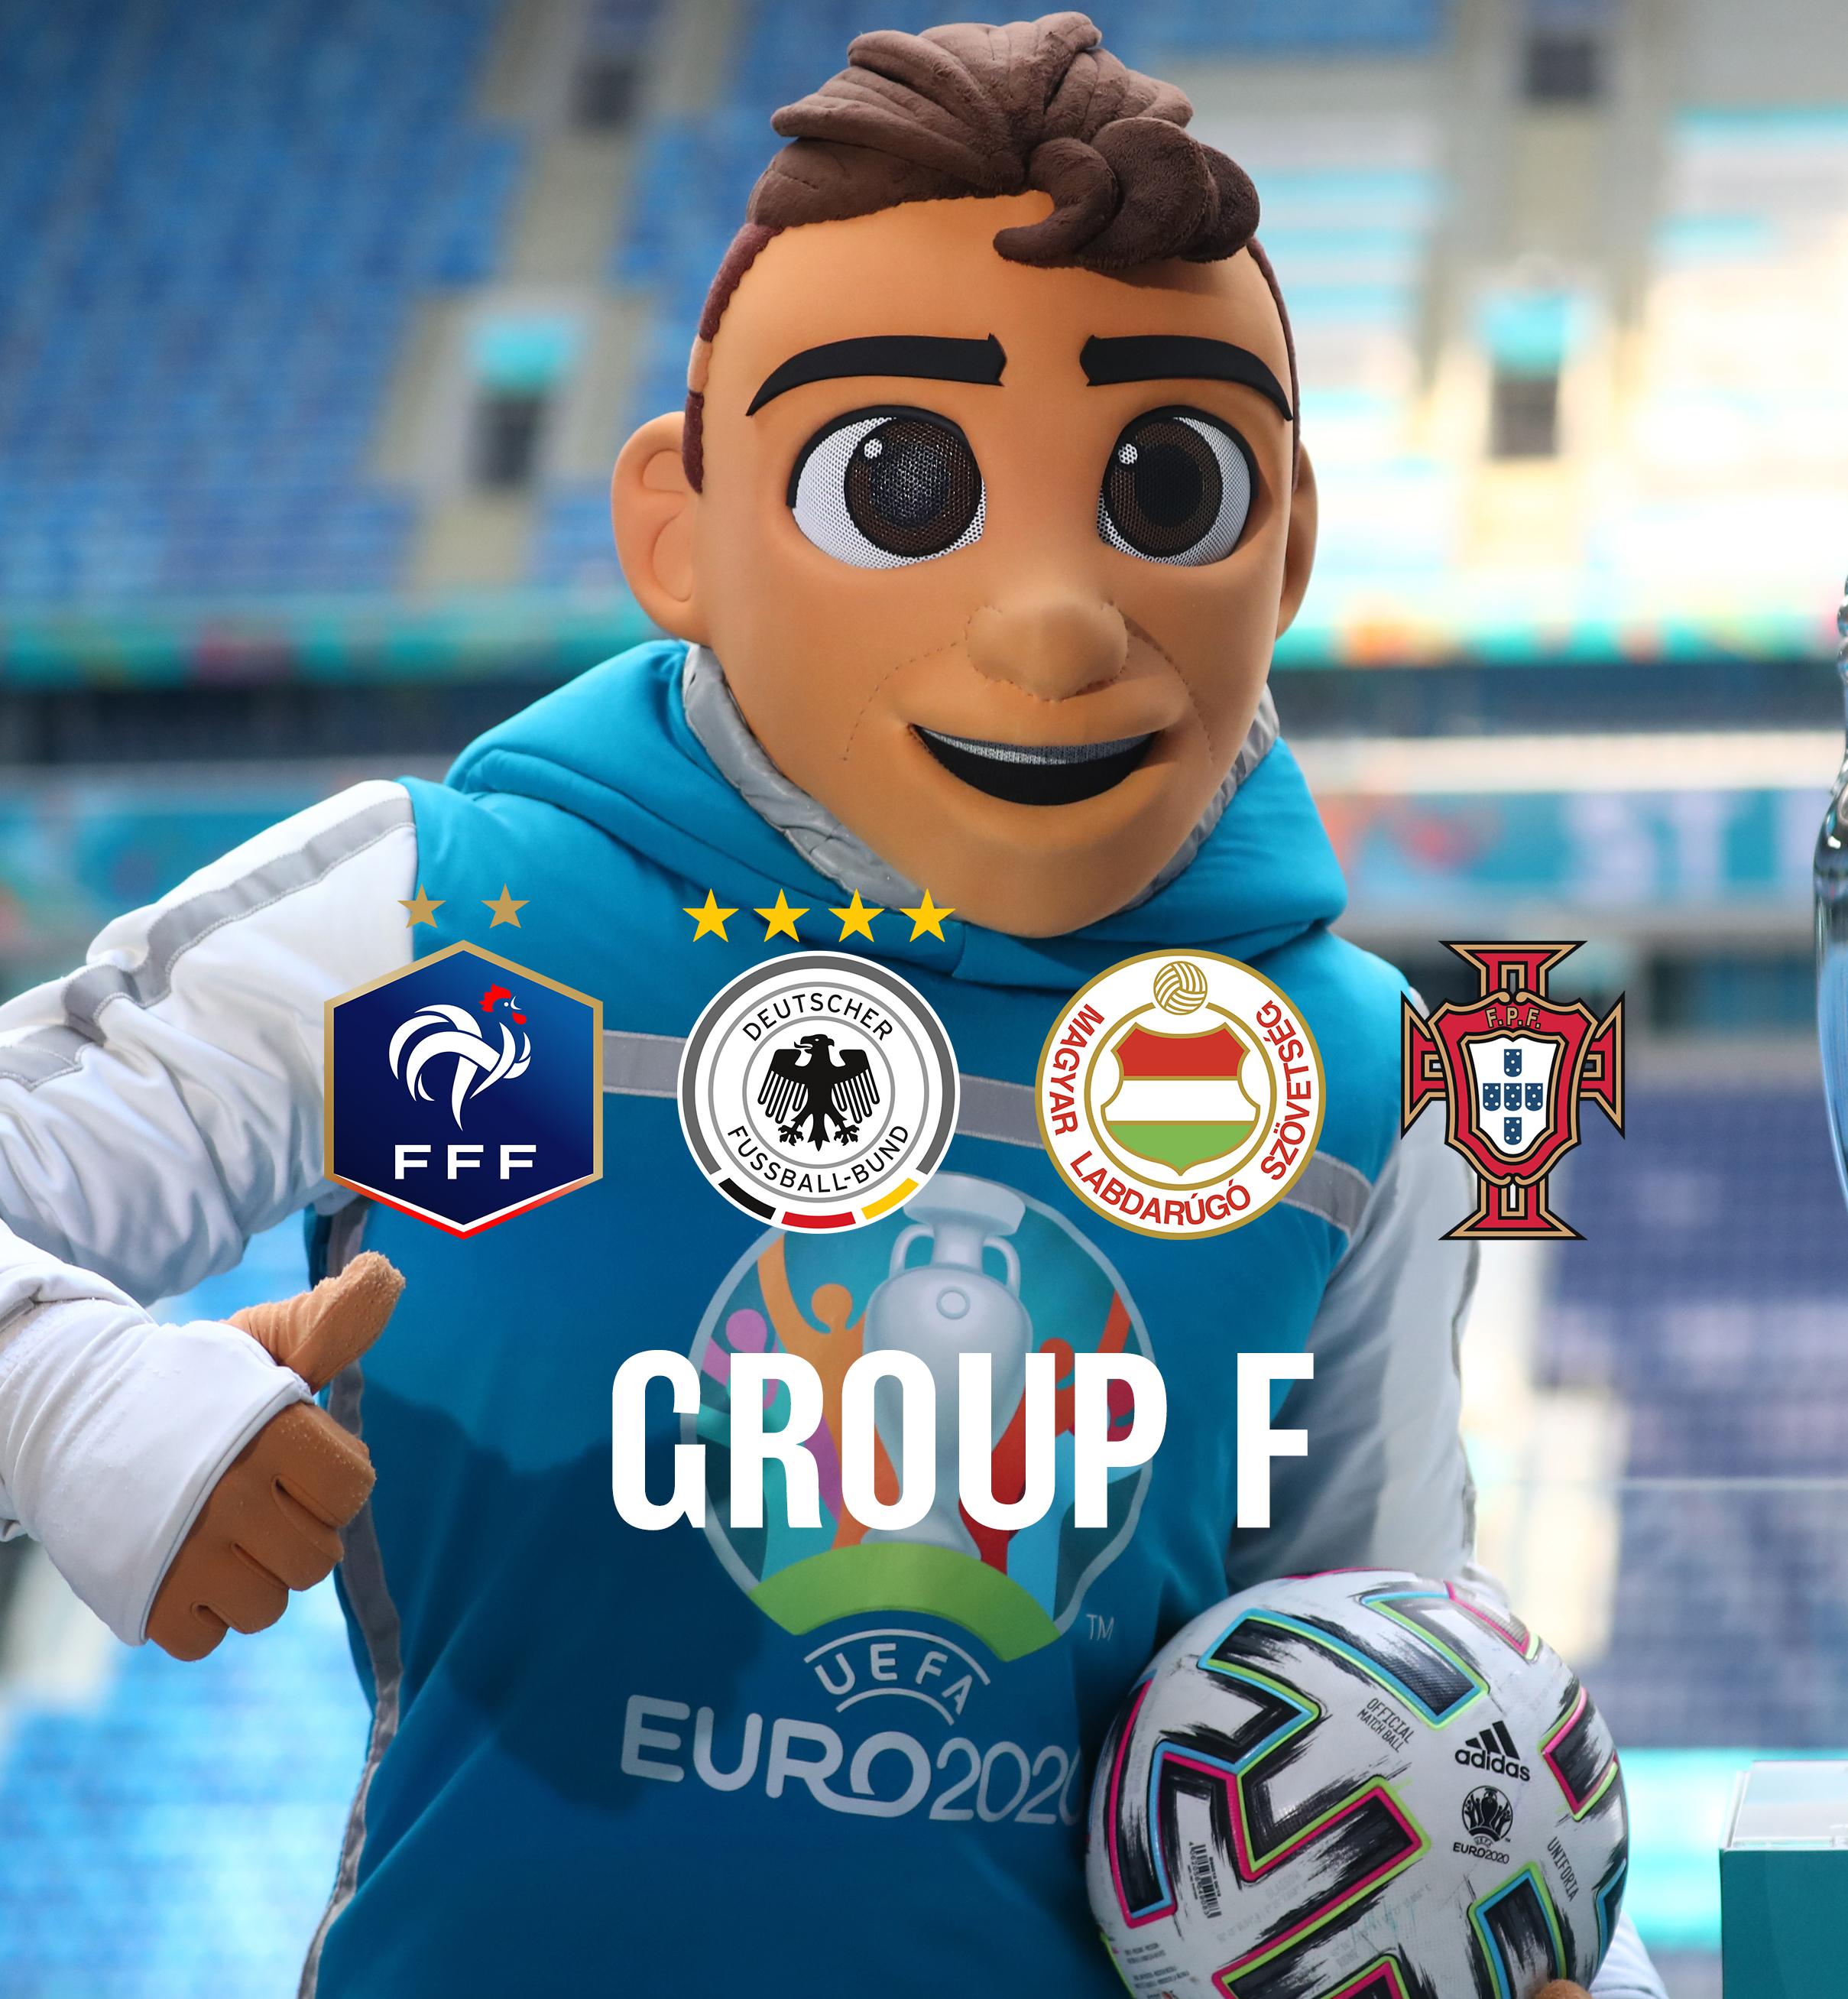 euro 2020 group f mobile